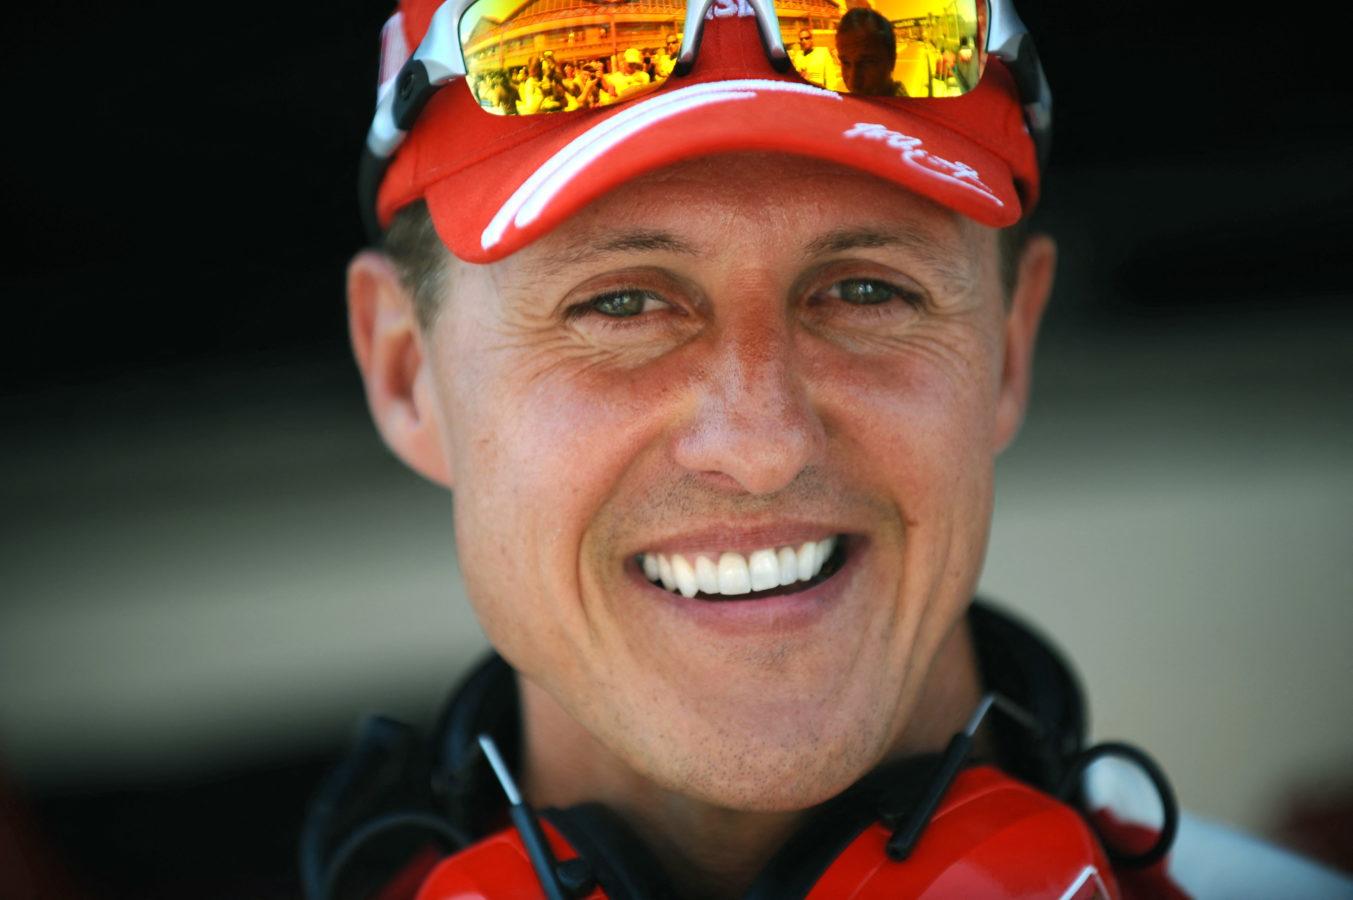 New Netflix film unearths the lesser-known side of Michael Schumacher